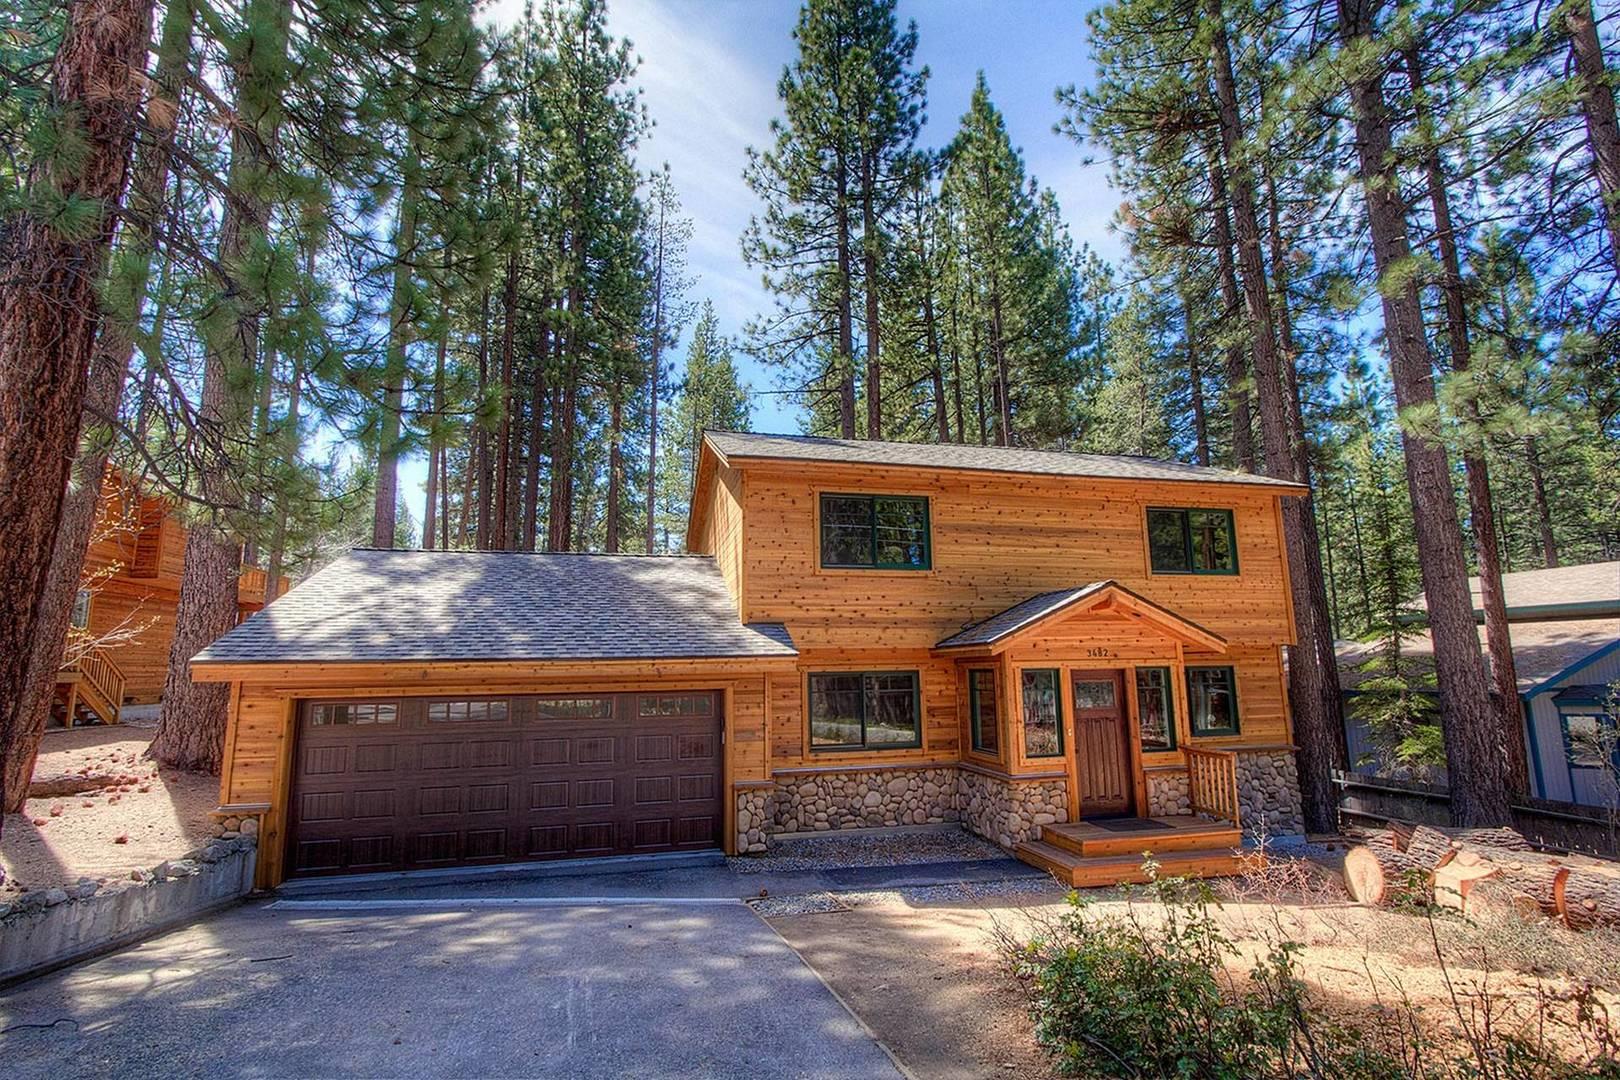 hch0682 lake tahoe vacation rental